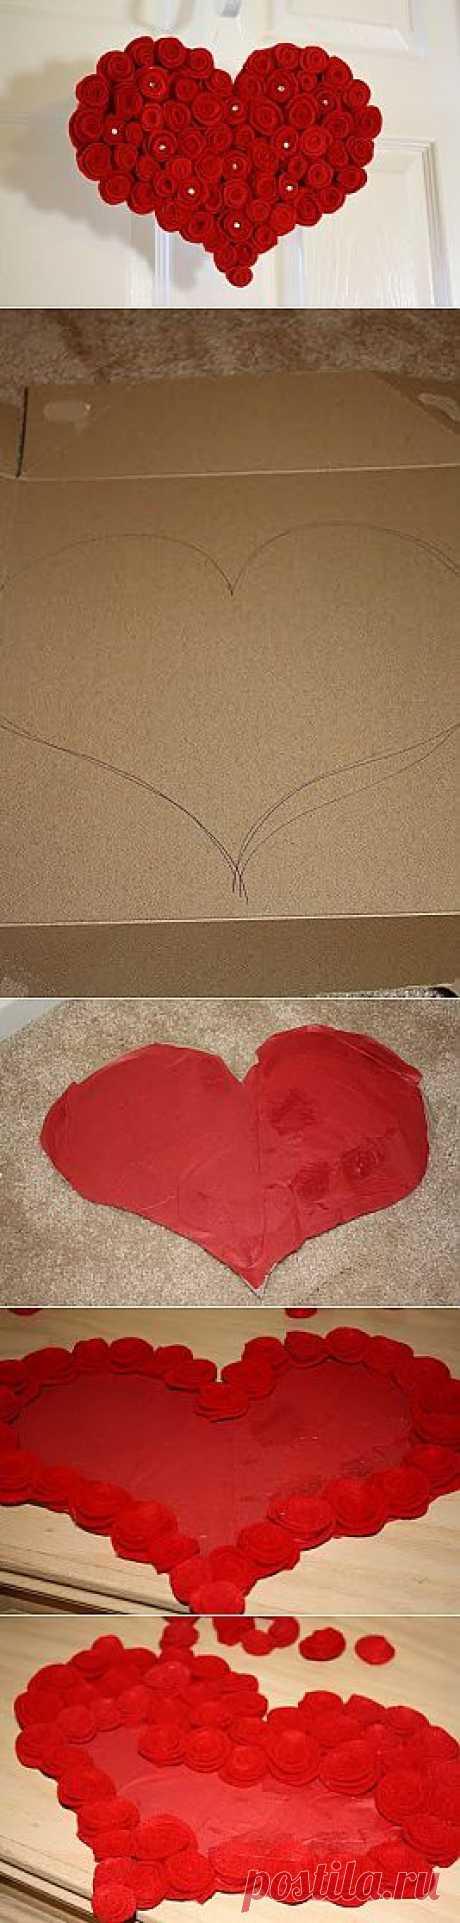 Поделки на день Валентина – Сердце из роз мастер класс | Самоделки